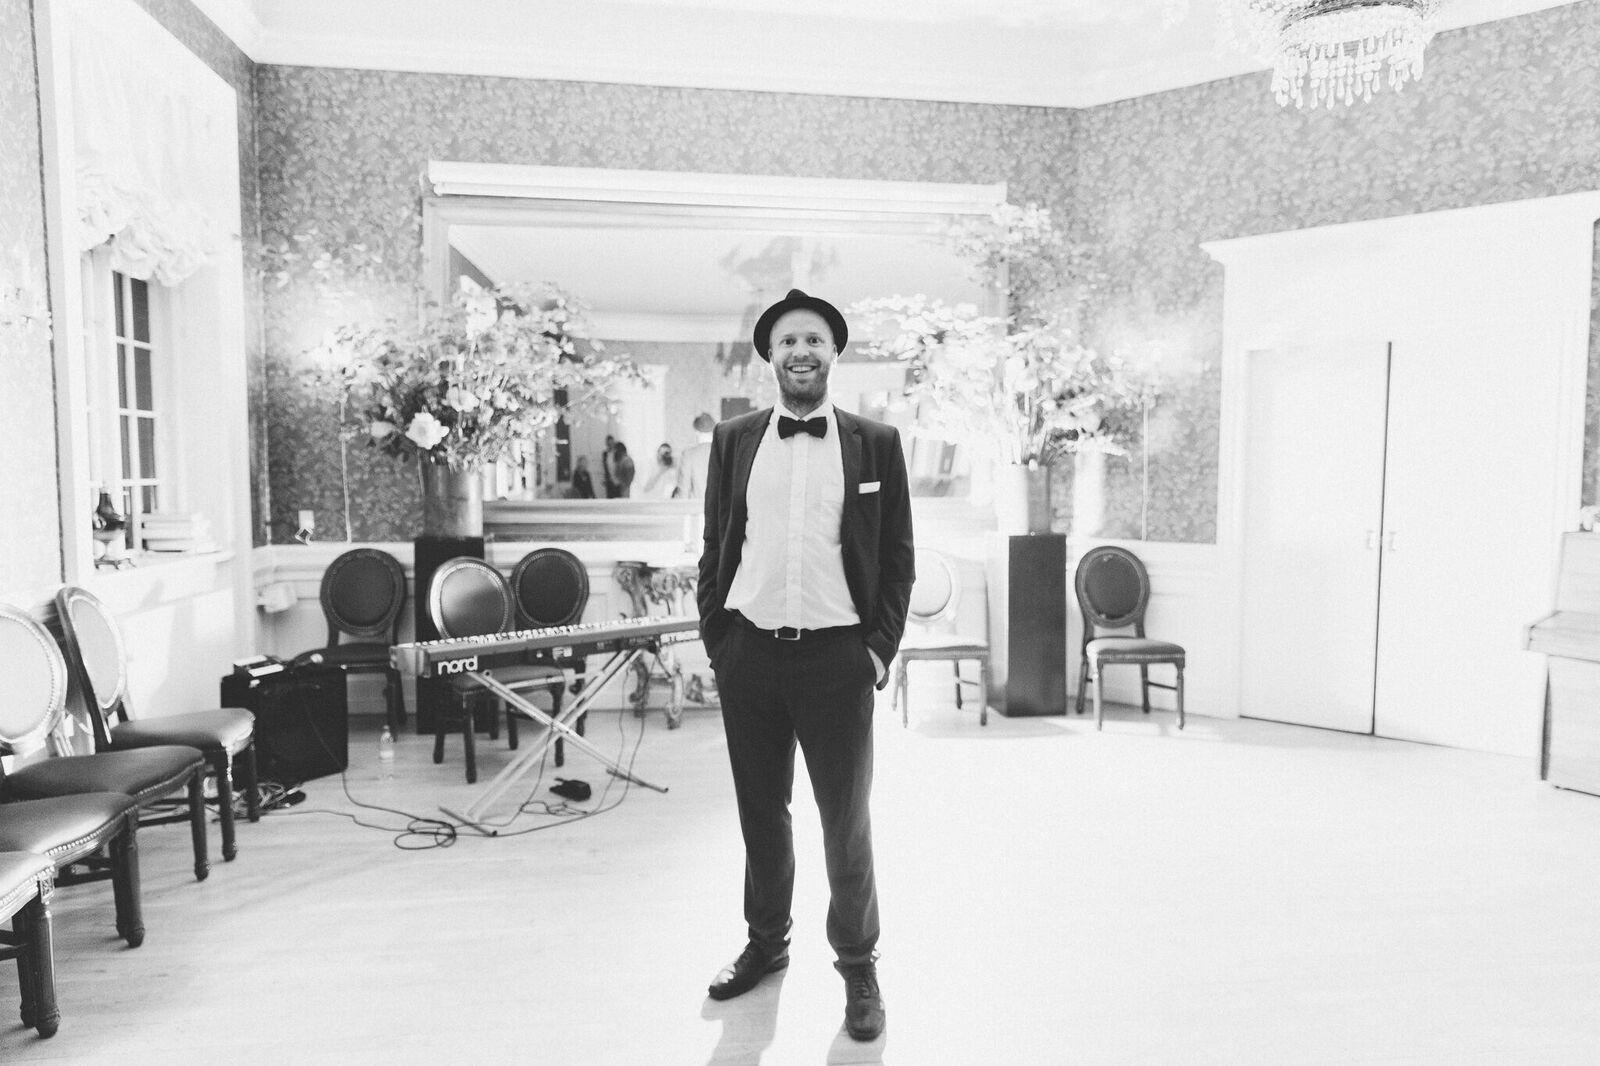 Pianist til bryllup